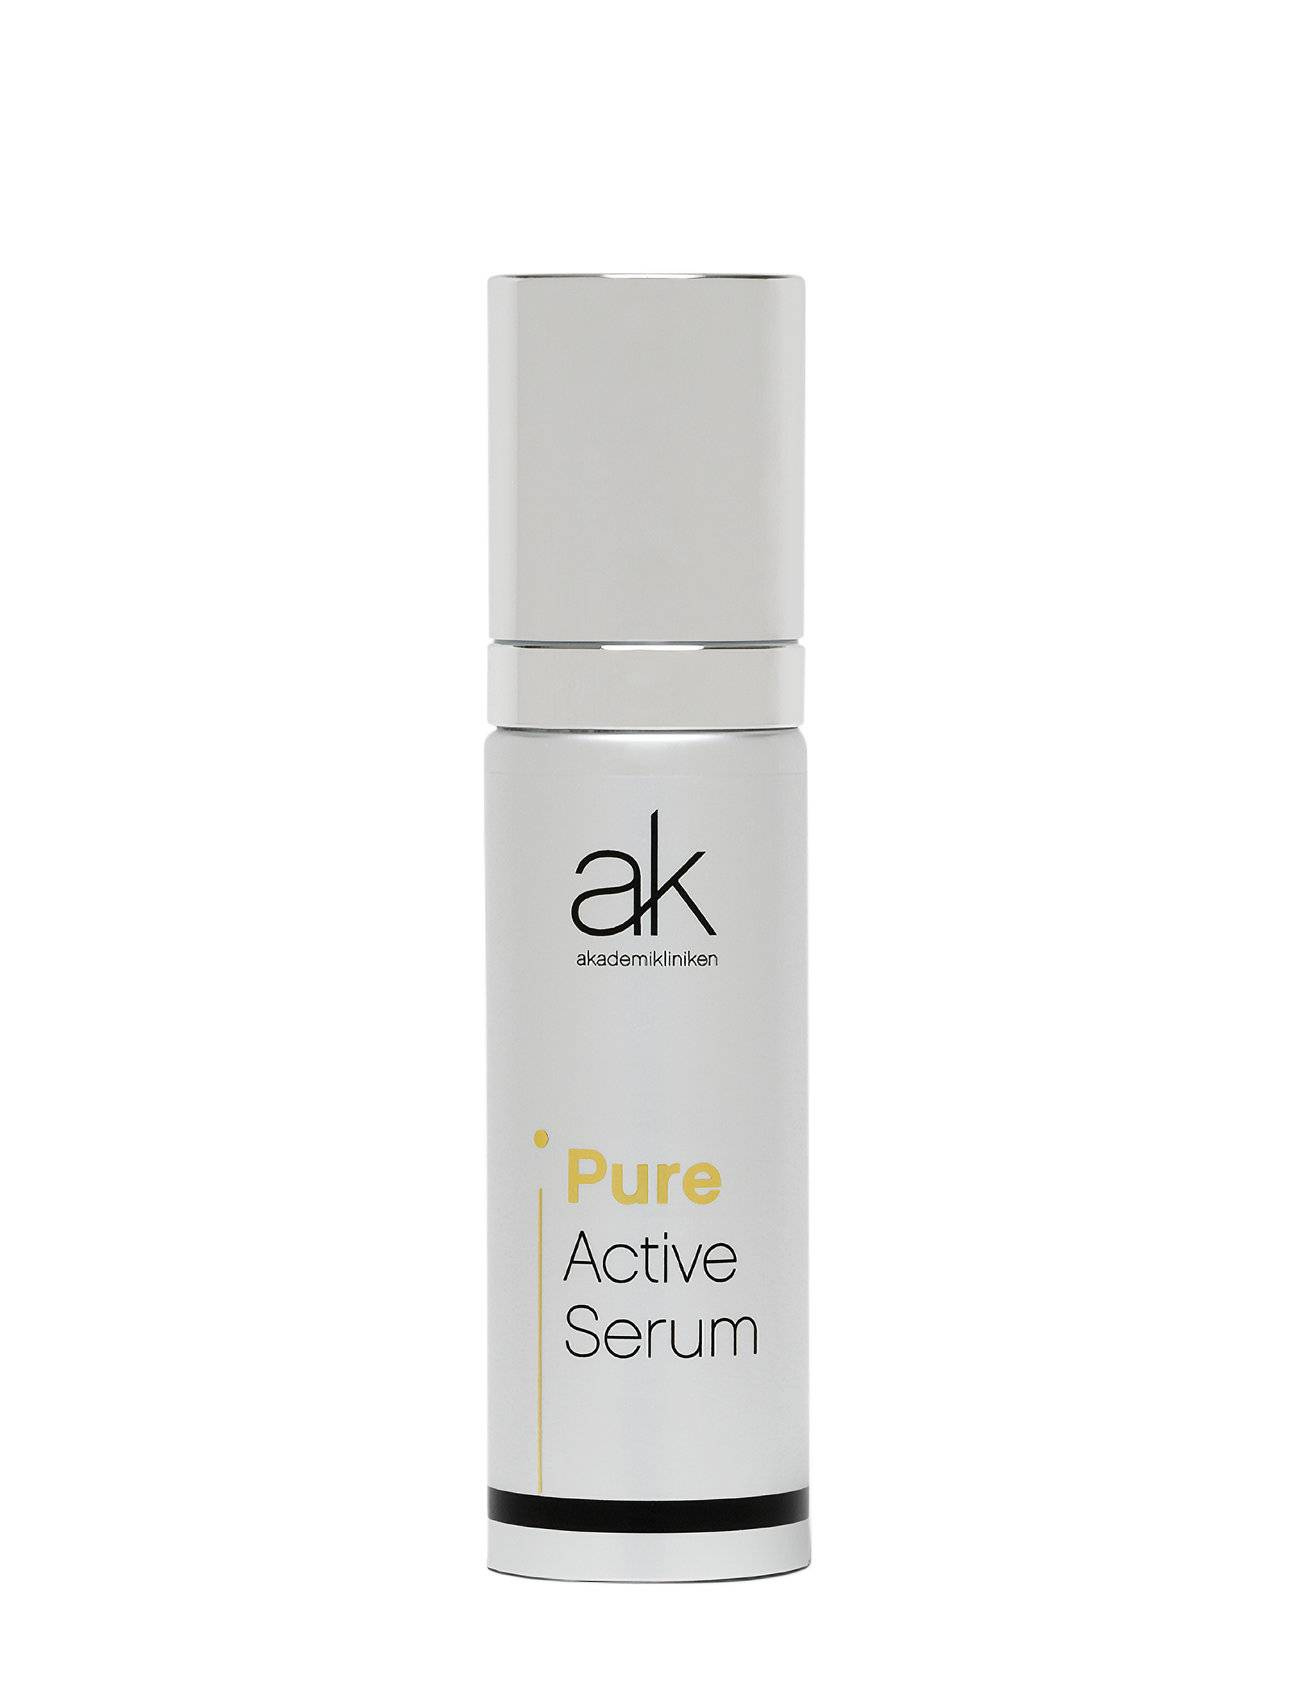 Akademikliniken Skincare Pure Active Serum Seerumi Kasvot Ihonhoito Nude Akademikliniken Skincare